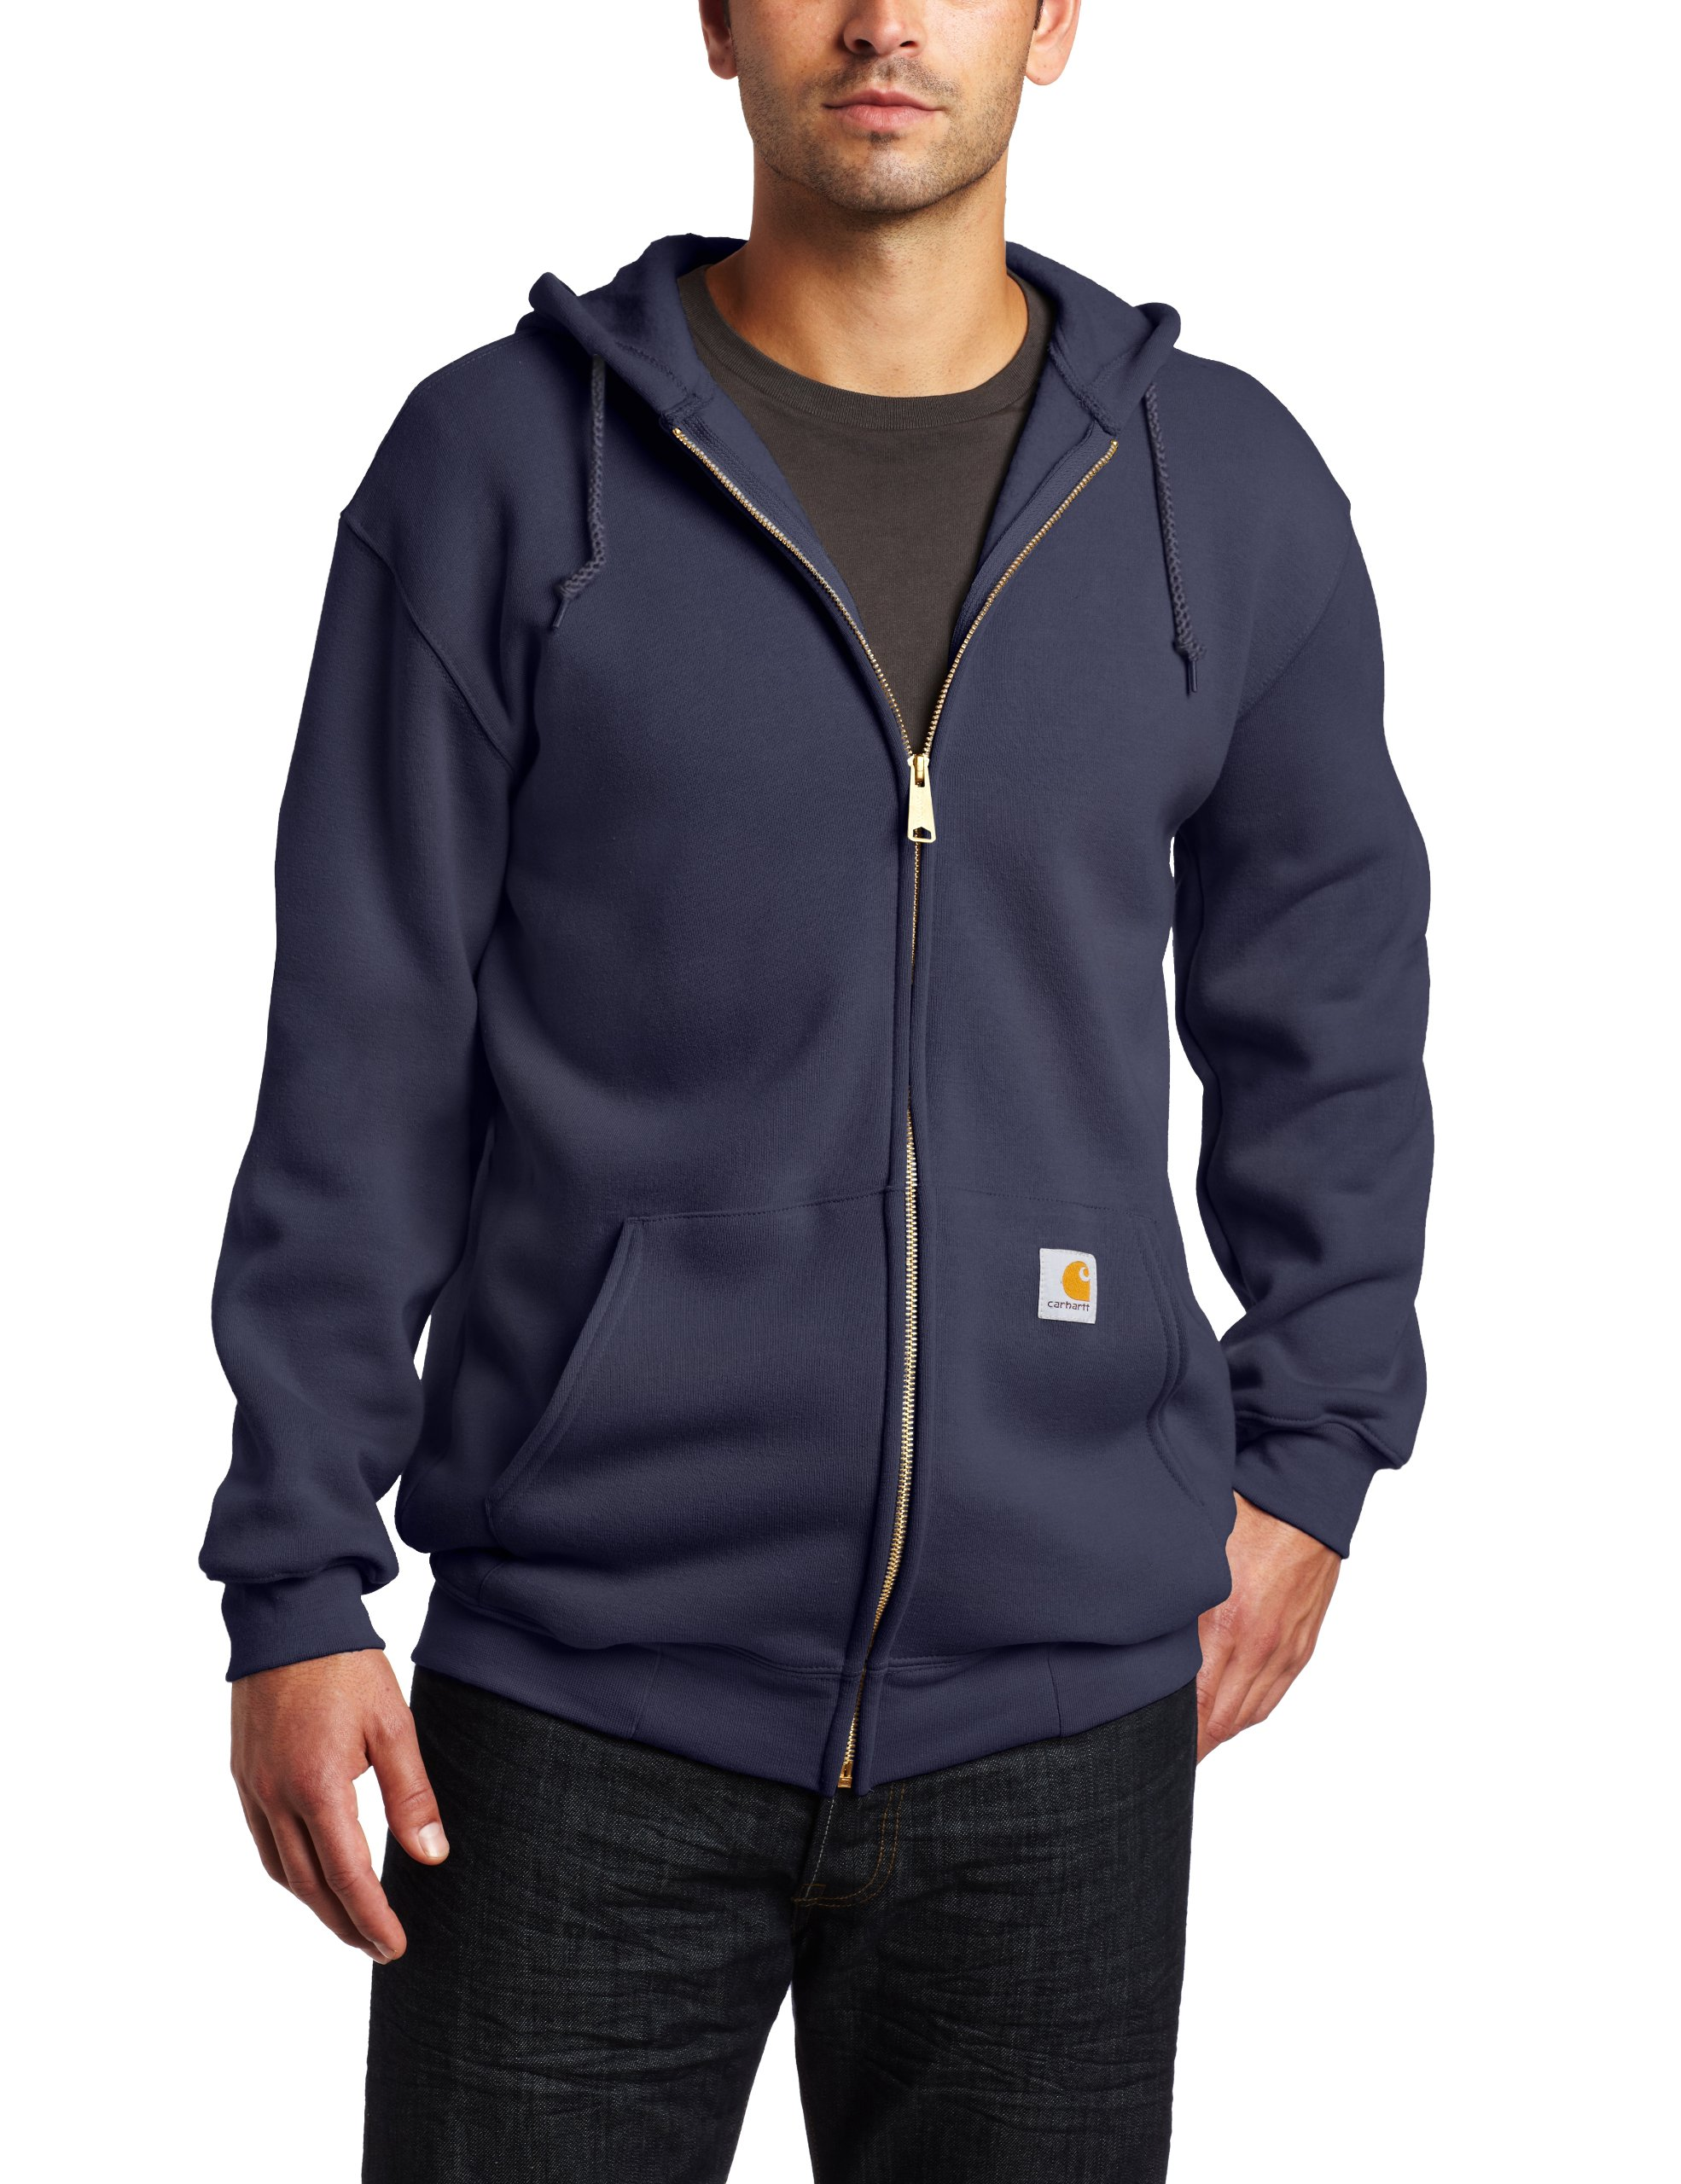 Carhartt Men's Big & Tall Midweight Sweatshirt Hooded Zip Front Original Fit,New Navy,XXXX-Large